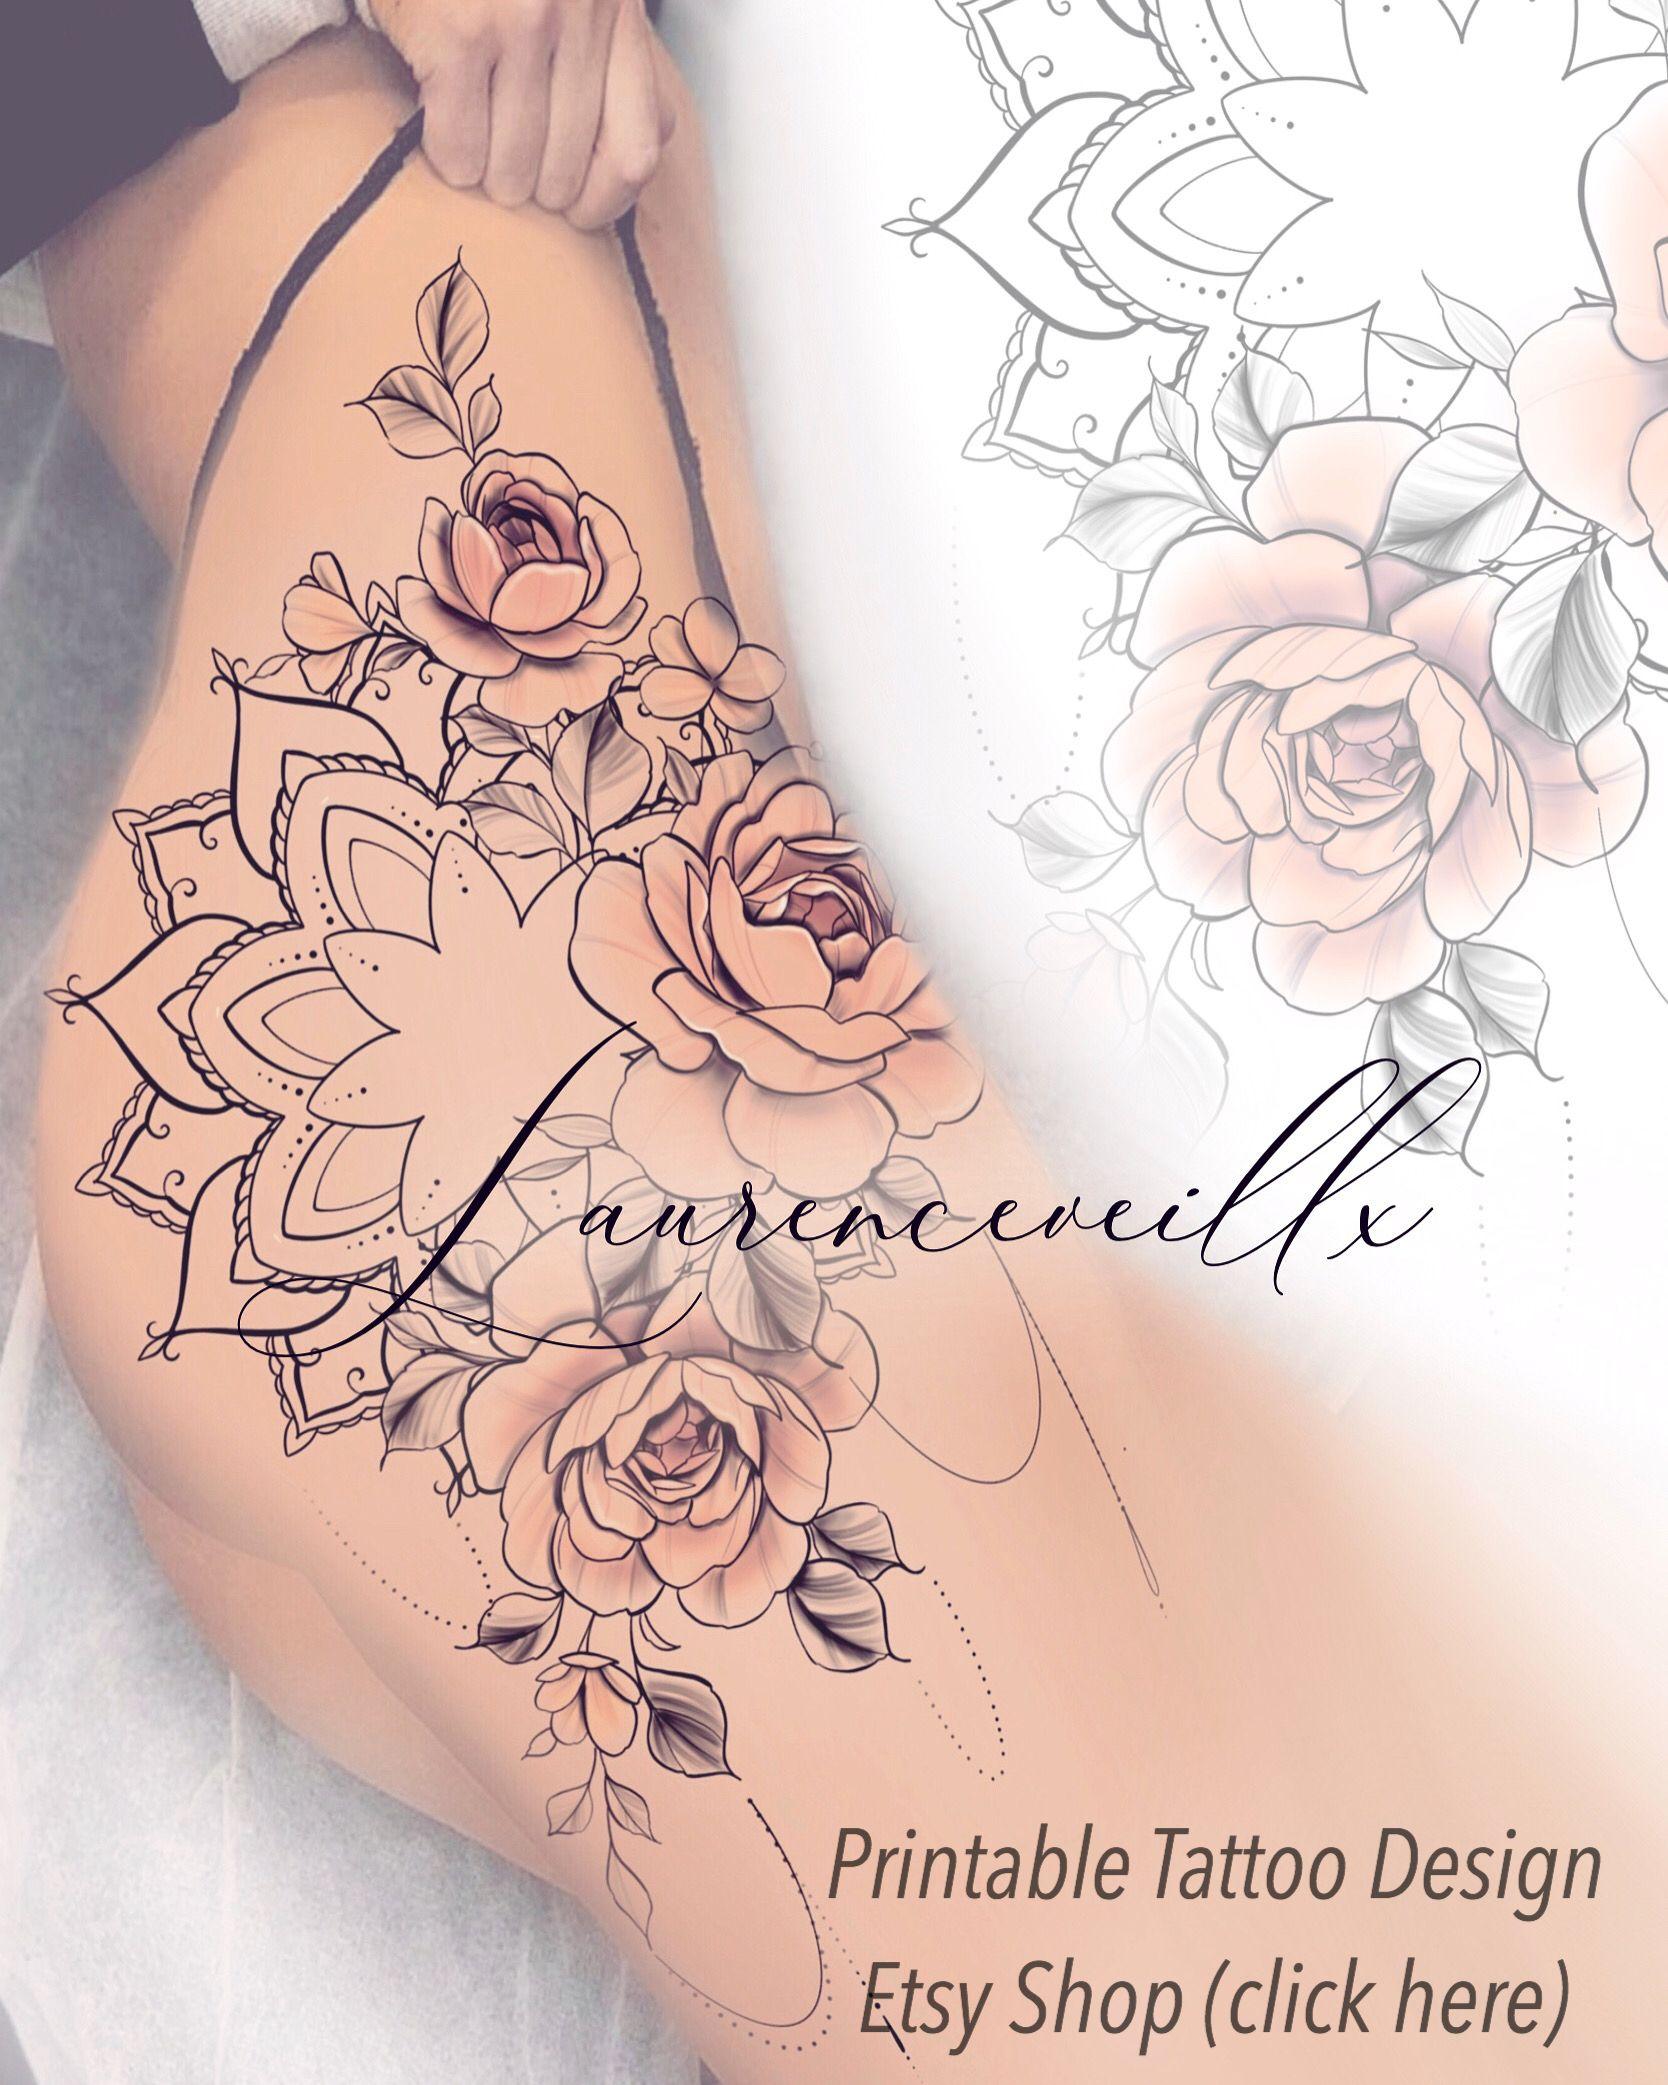 Printable Mandala Flowers Thigh Tattoo Design Available On Etsy Laurenceveillx In 2020 Tattoos Hip Tattoos Women Tattoo Designs